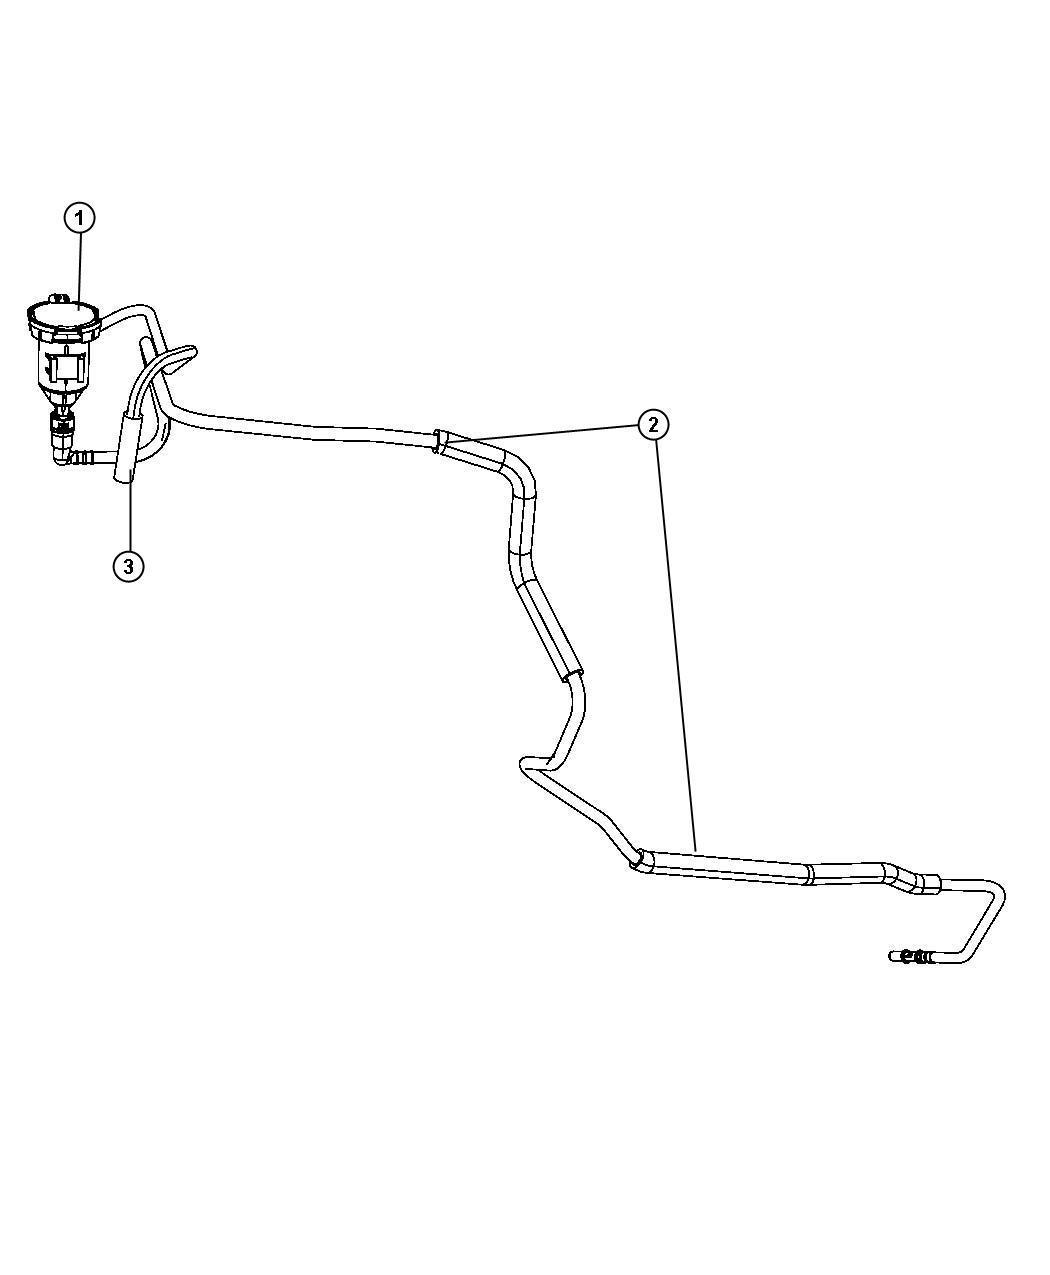 Dz Daihatsu Hijet Vacuum Hose Diagram Free Download